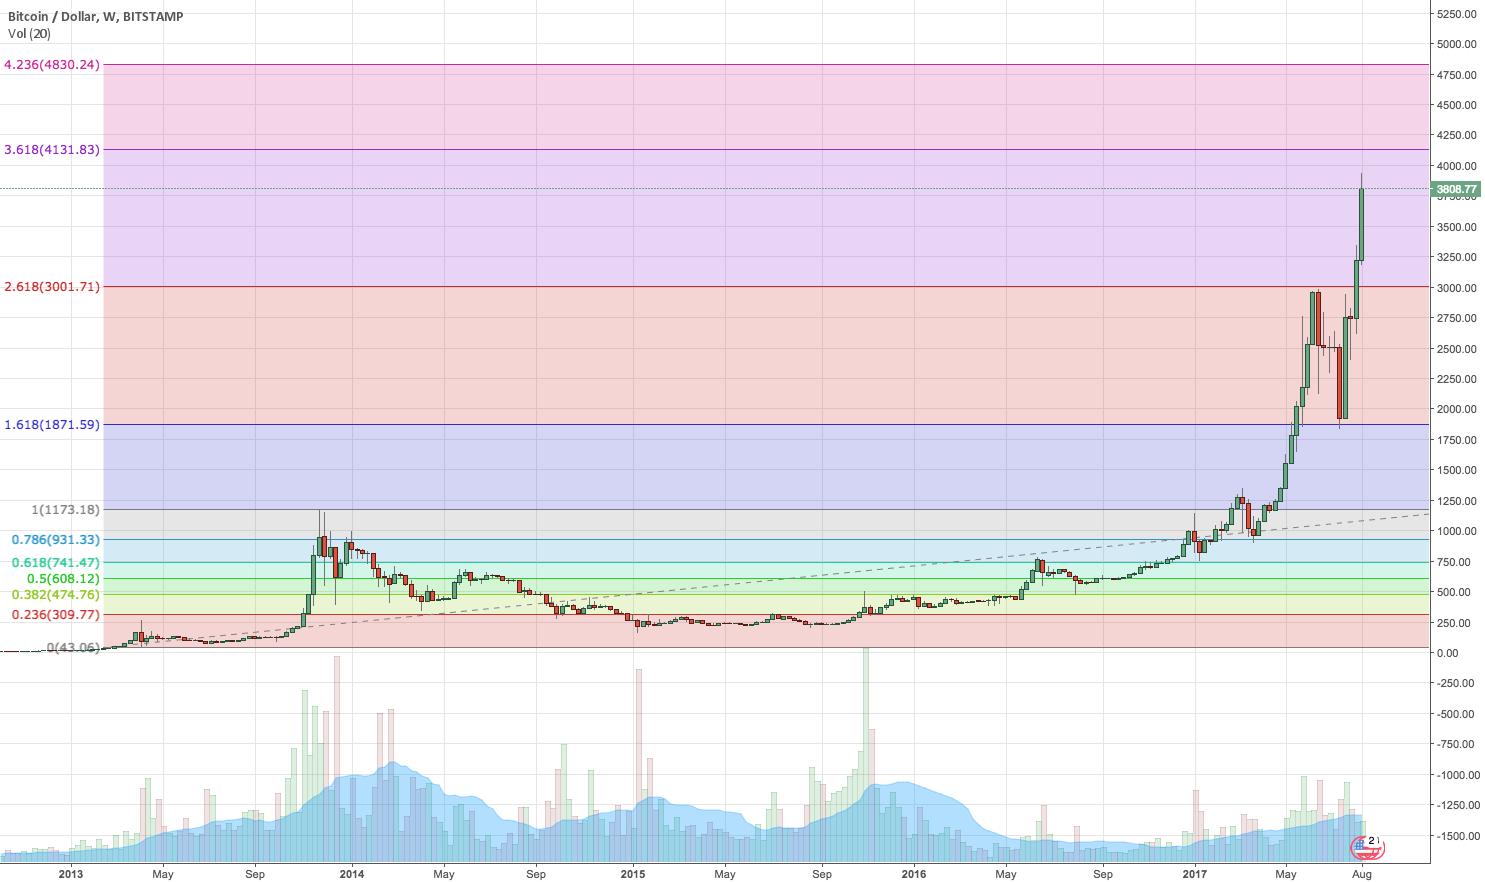 BTC's Oldest Fibonacci - room for more growth before a crash?